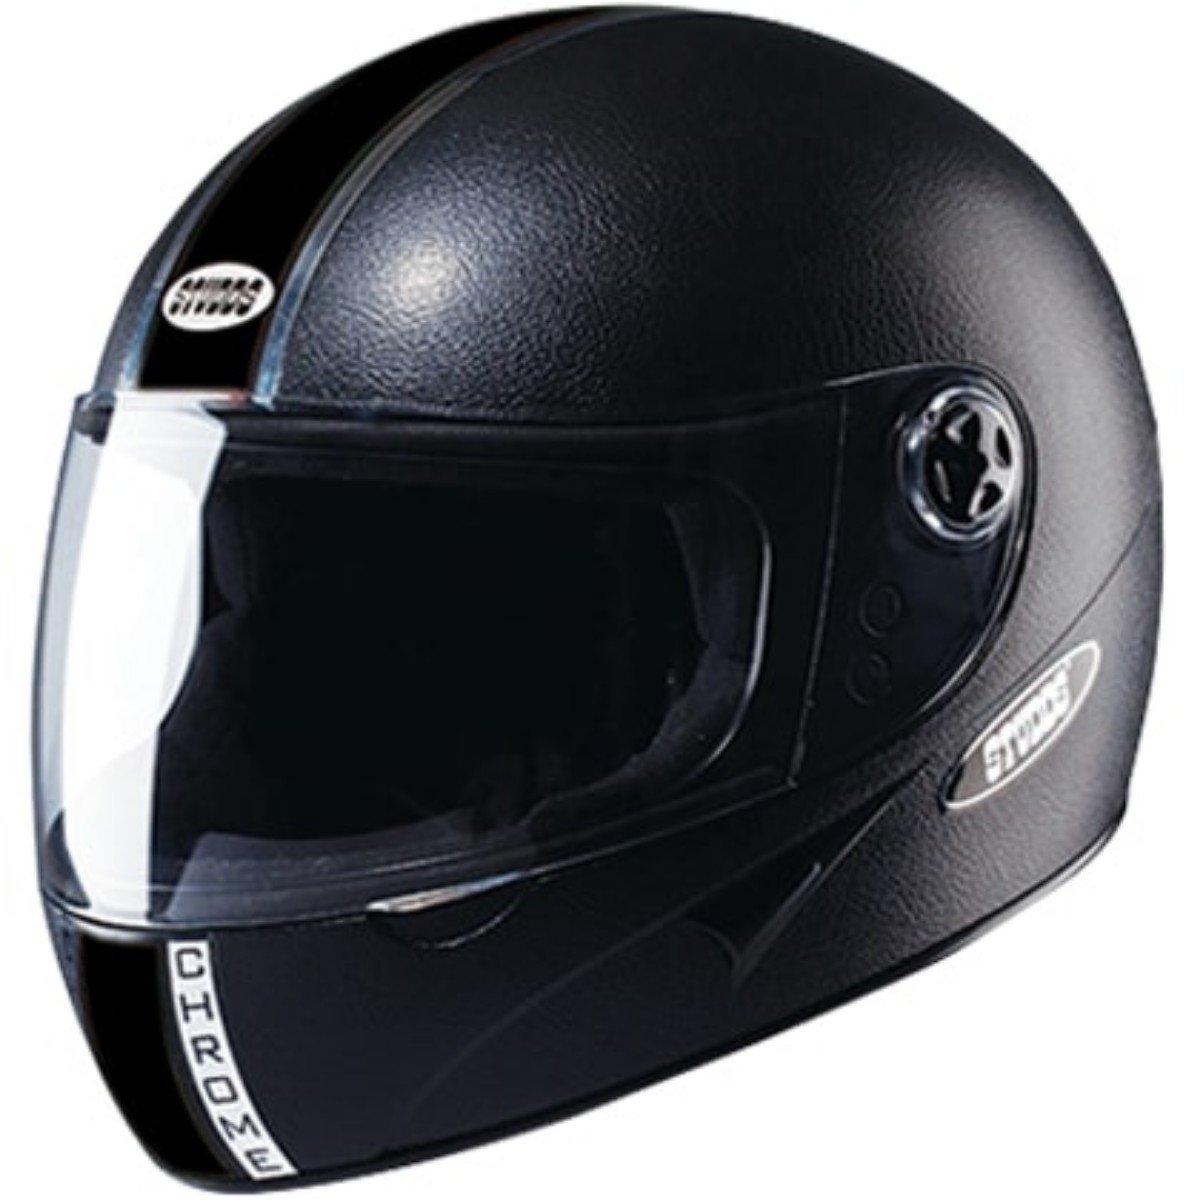 Studds Chrome Eco With Mirror Visor Bike Helmet